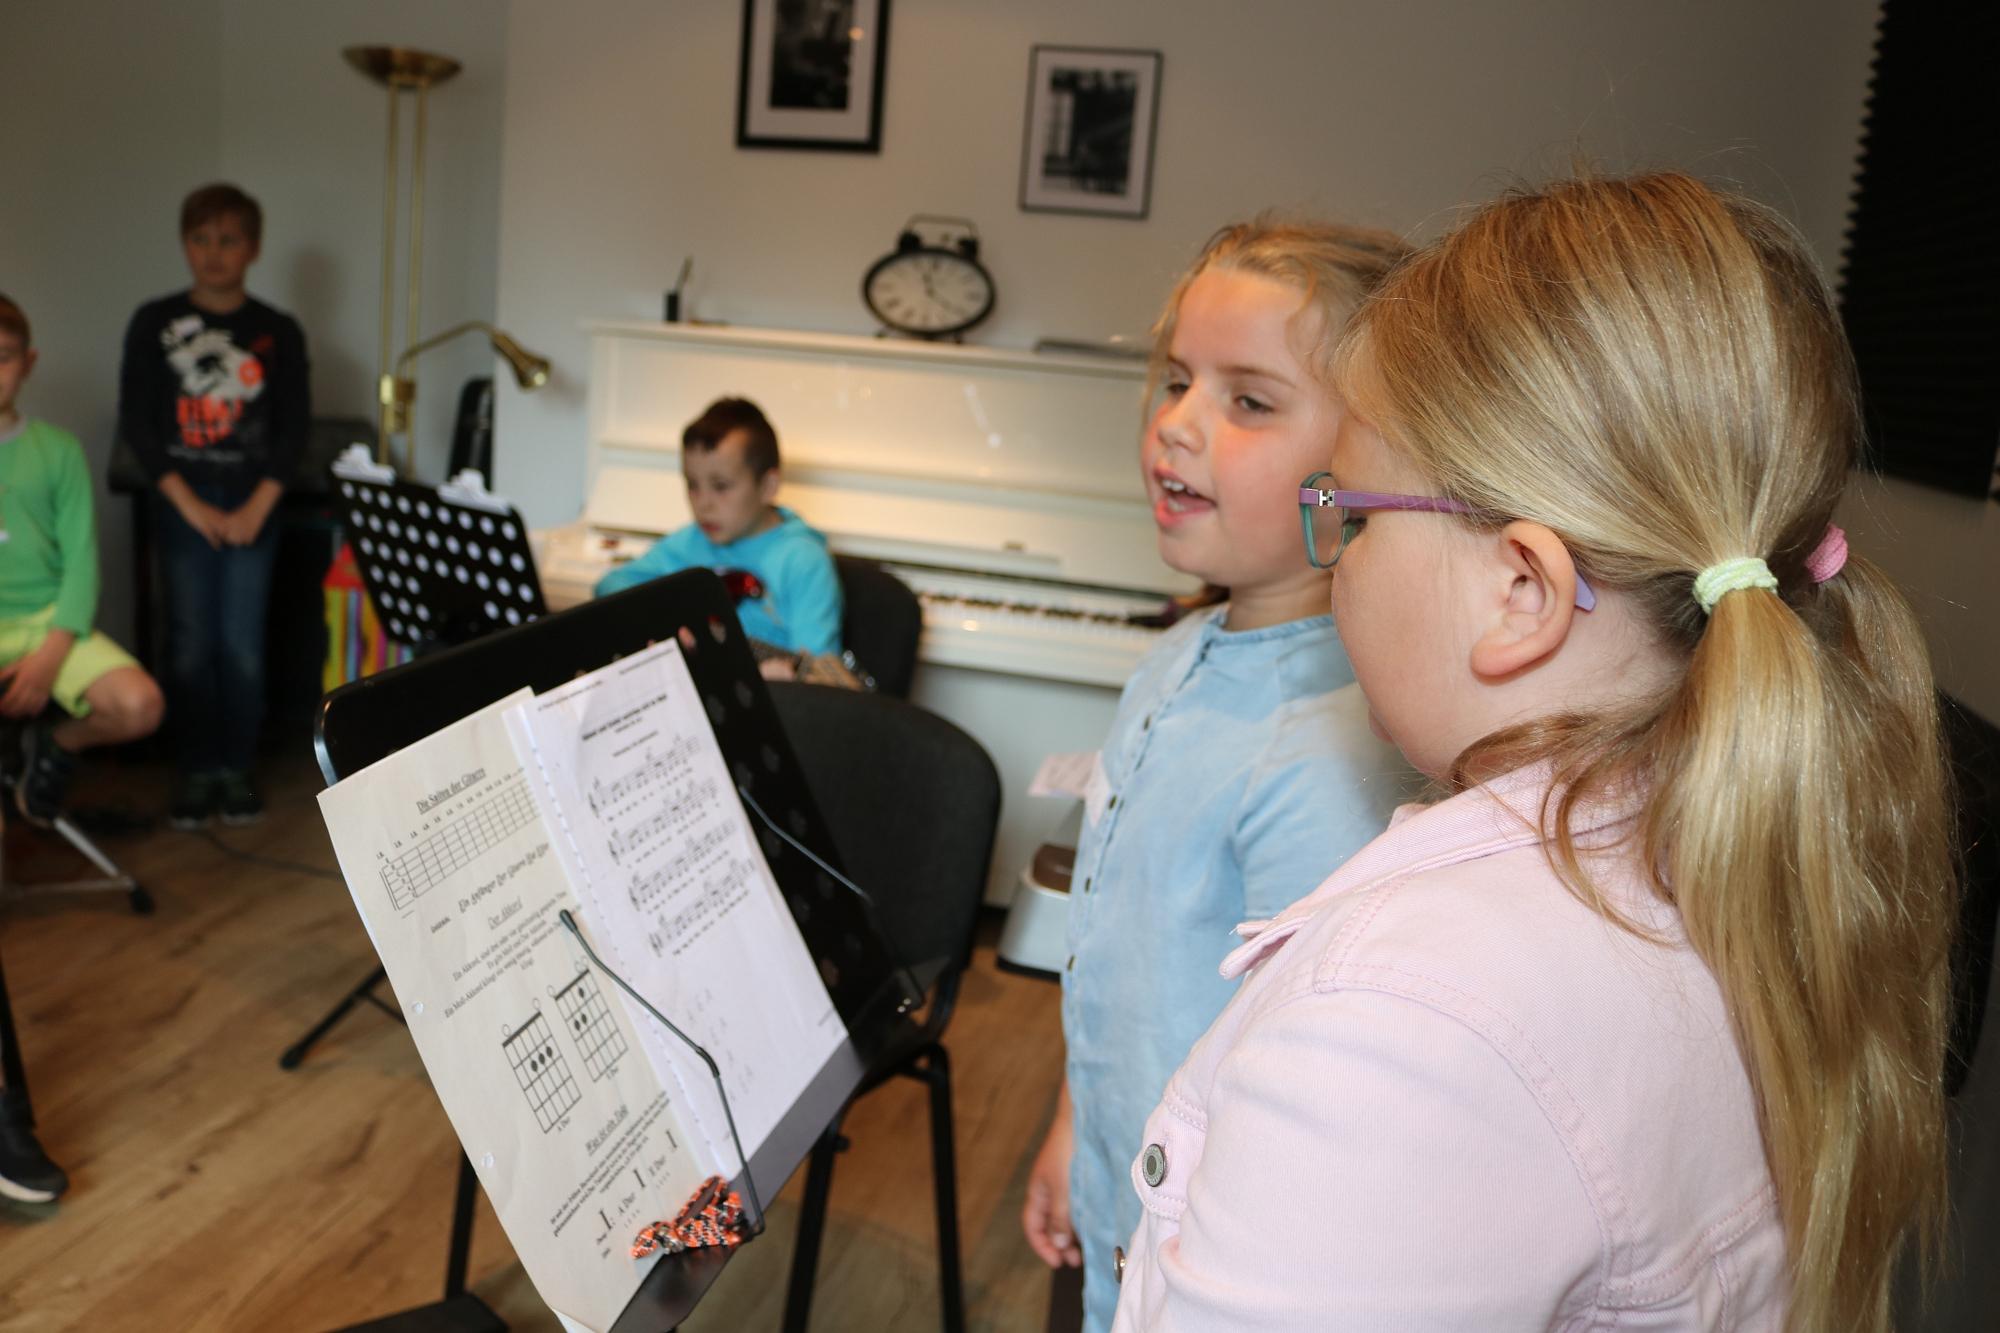 202007 Bandprobe FP Musikschule Harmonie 14